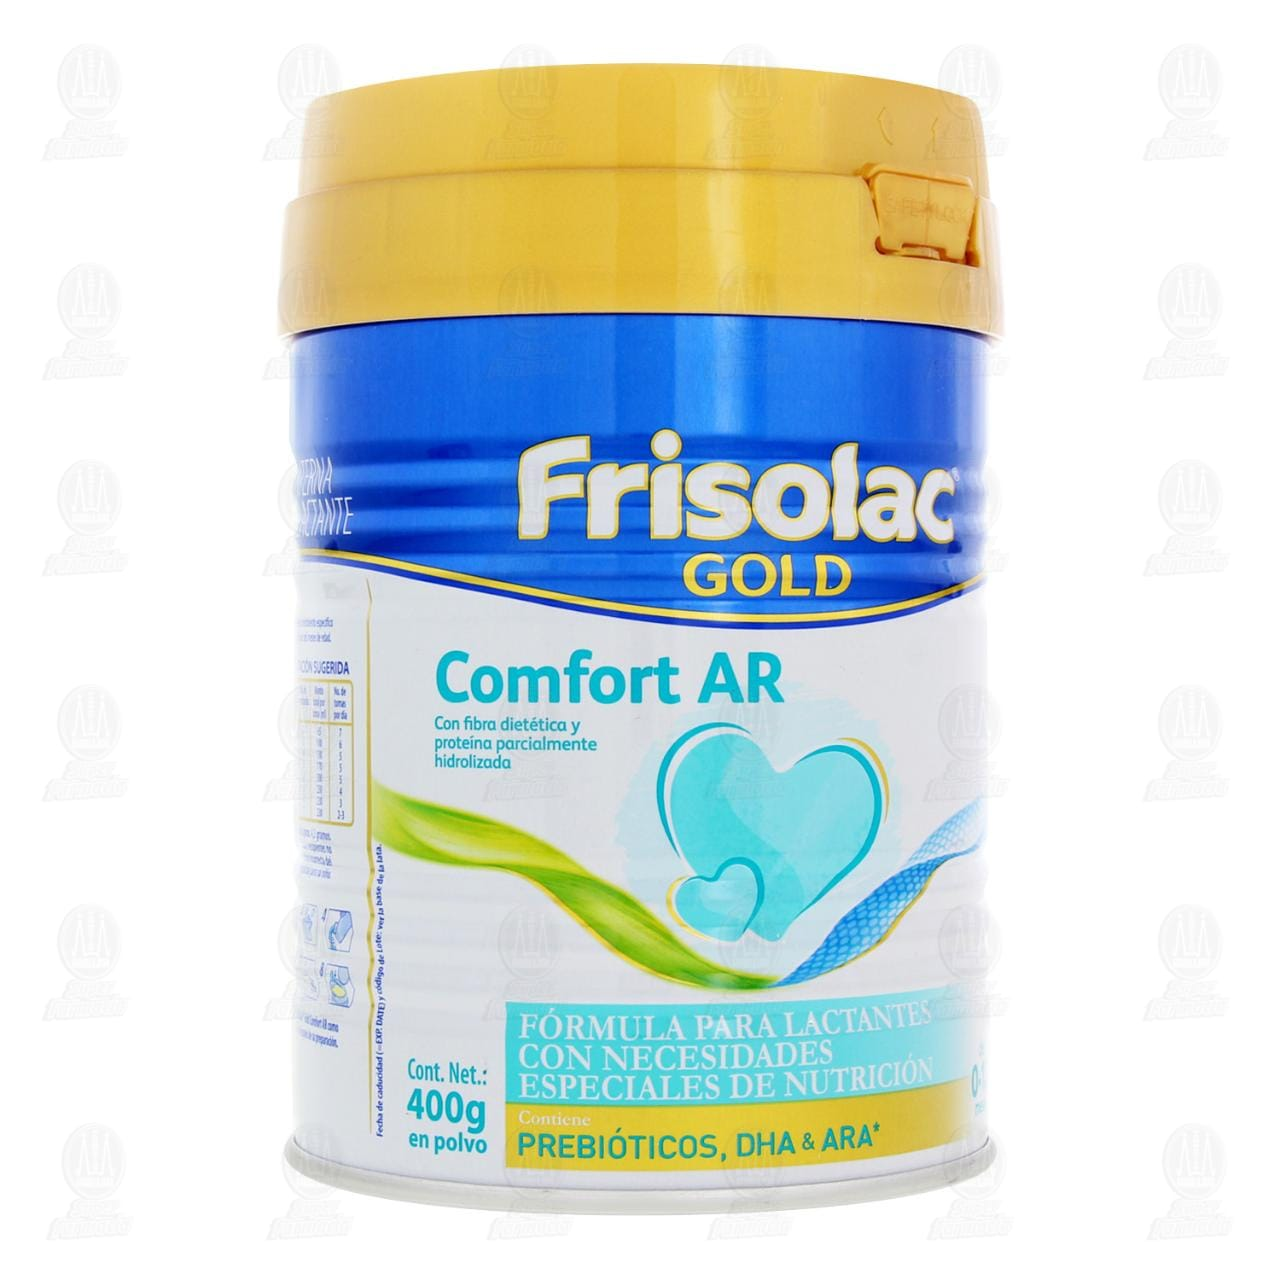 Comprar Fórmula Infantil Frisolac Gold Comfort en Polvo (Edad 0-12 Meses), 400 gr. en Farmacias Guadalajara